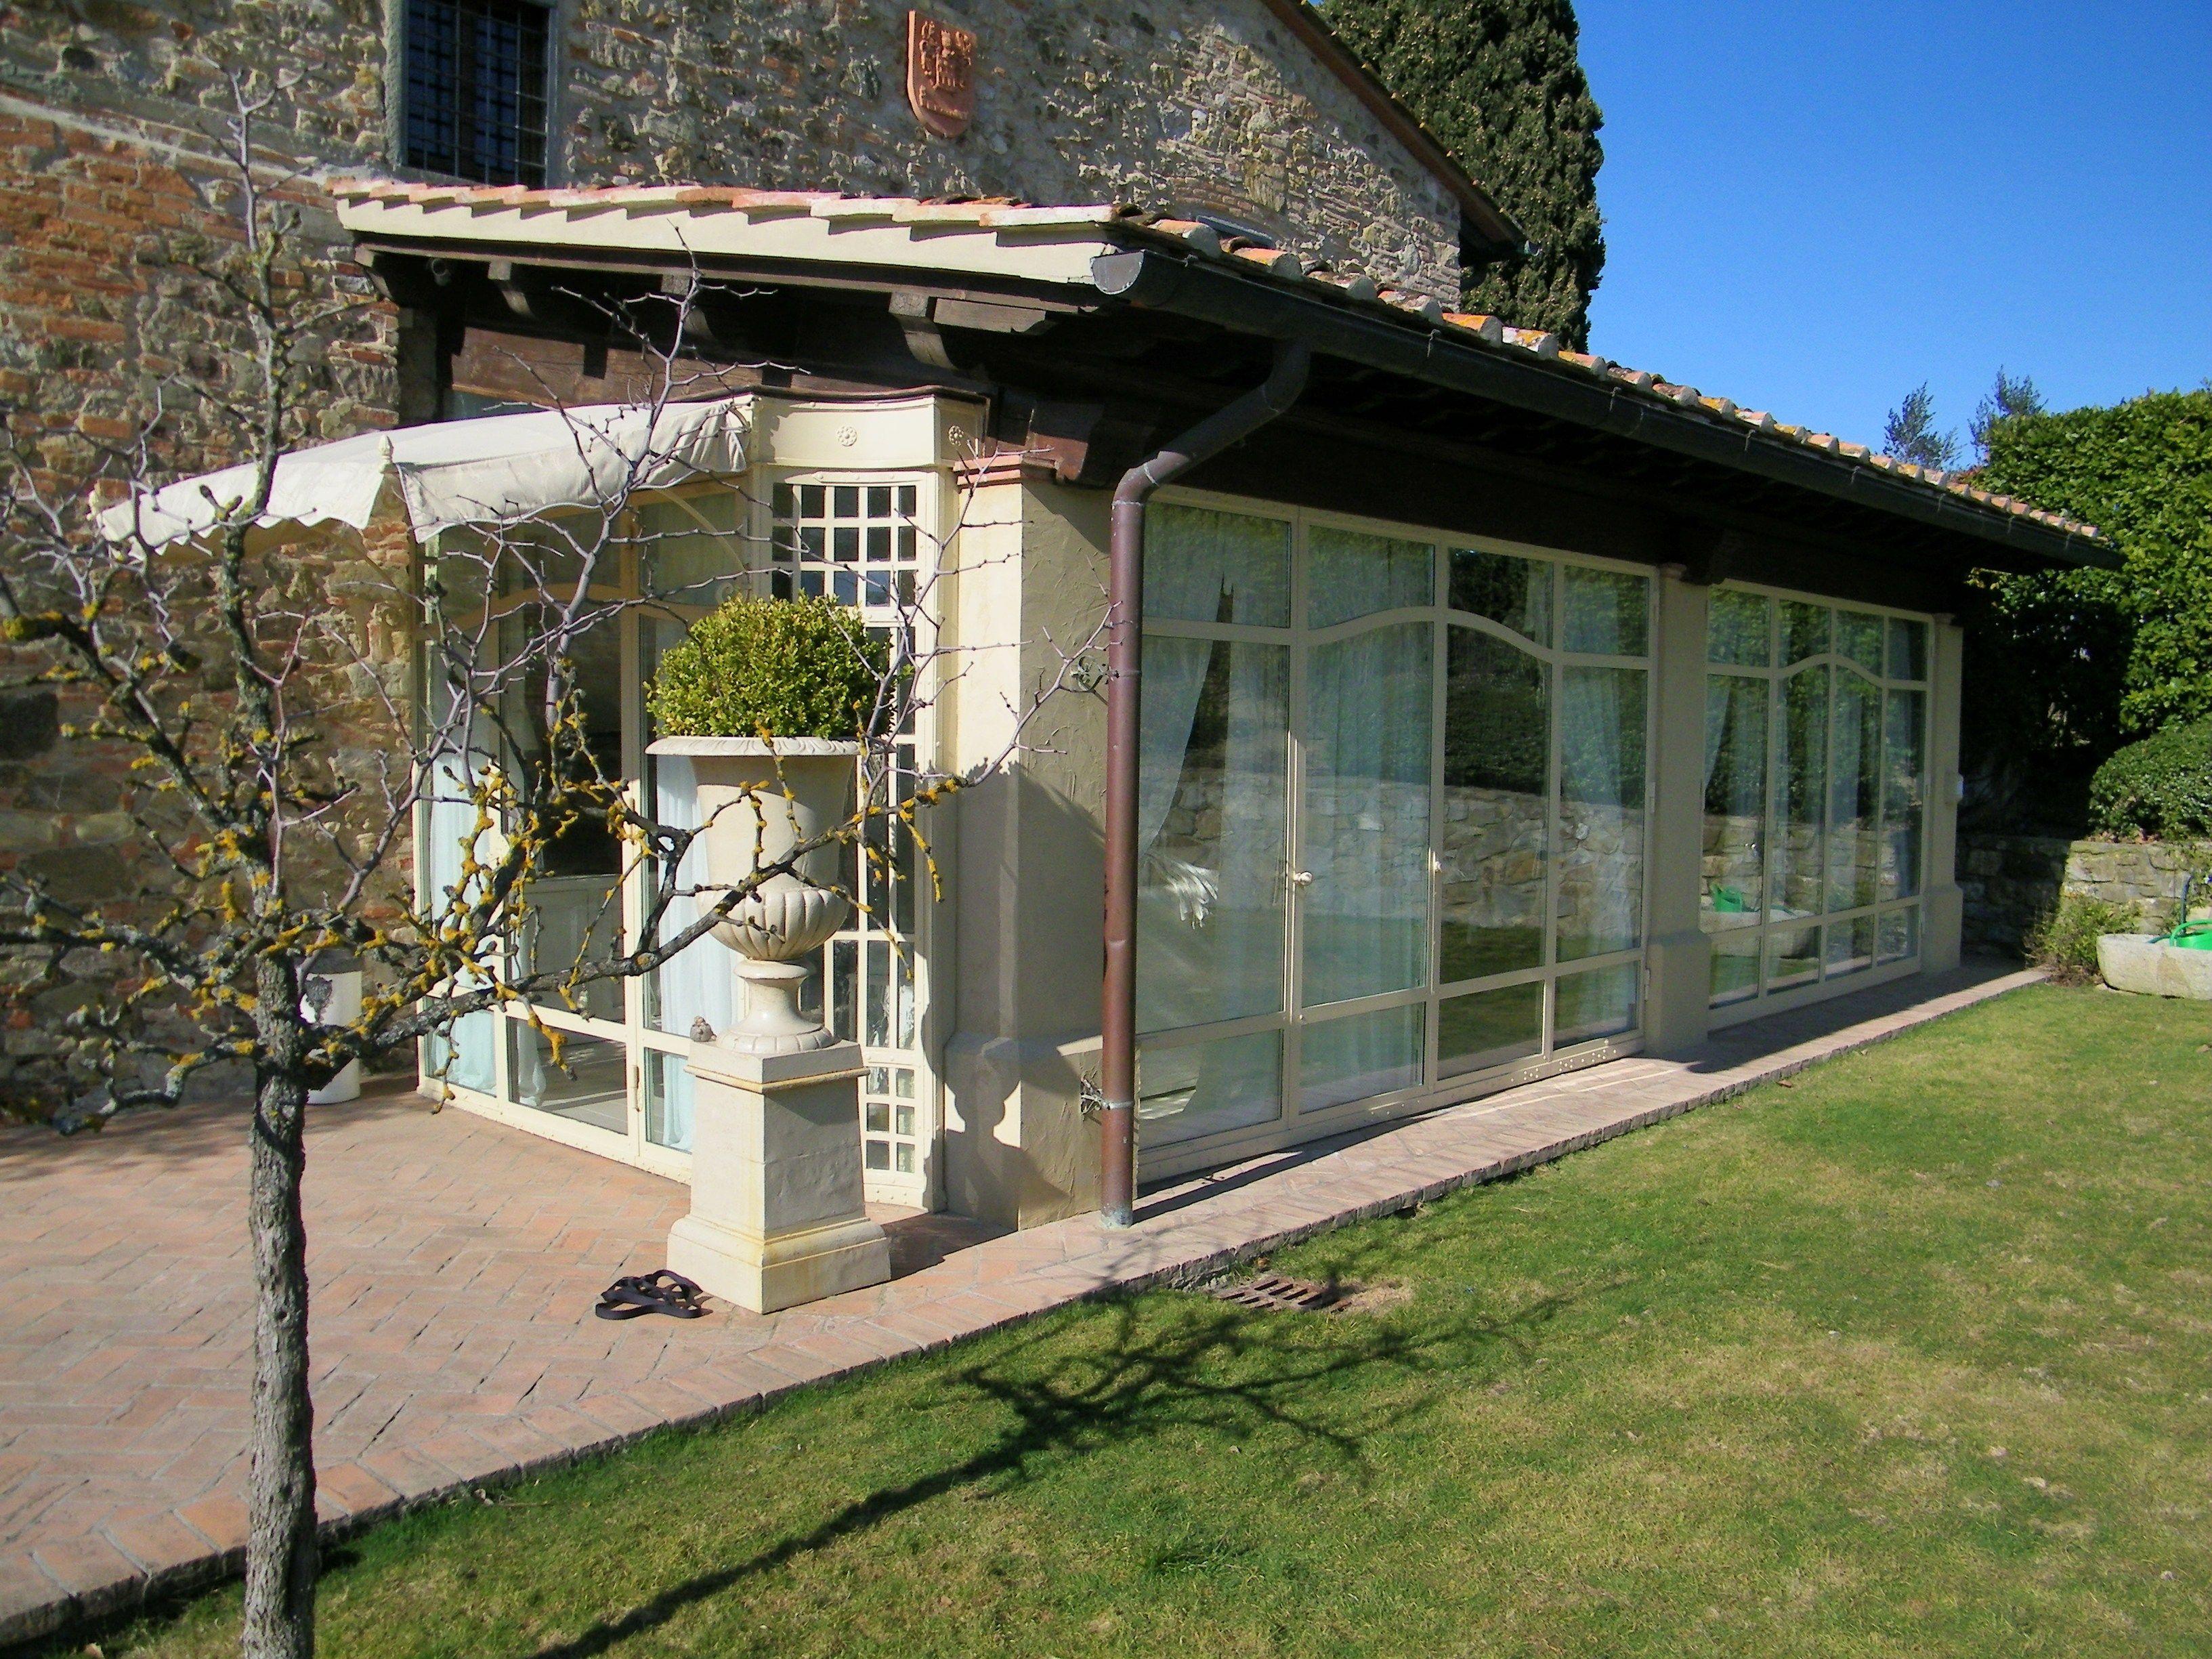 Giardino d 39 inverno 6 by garden house lazzerini - Giardino d inverno prezzo ...